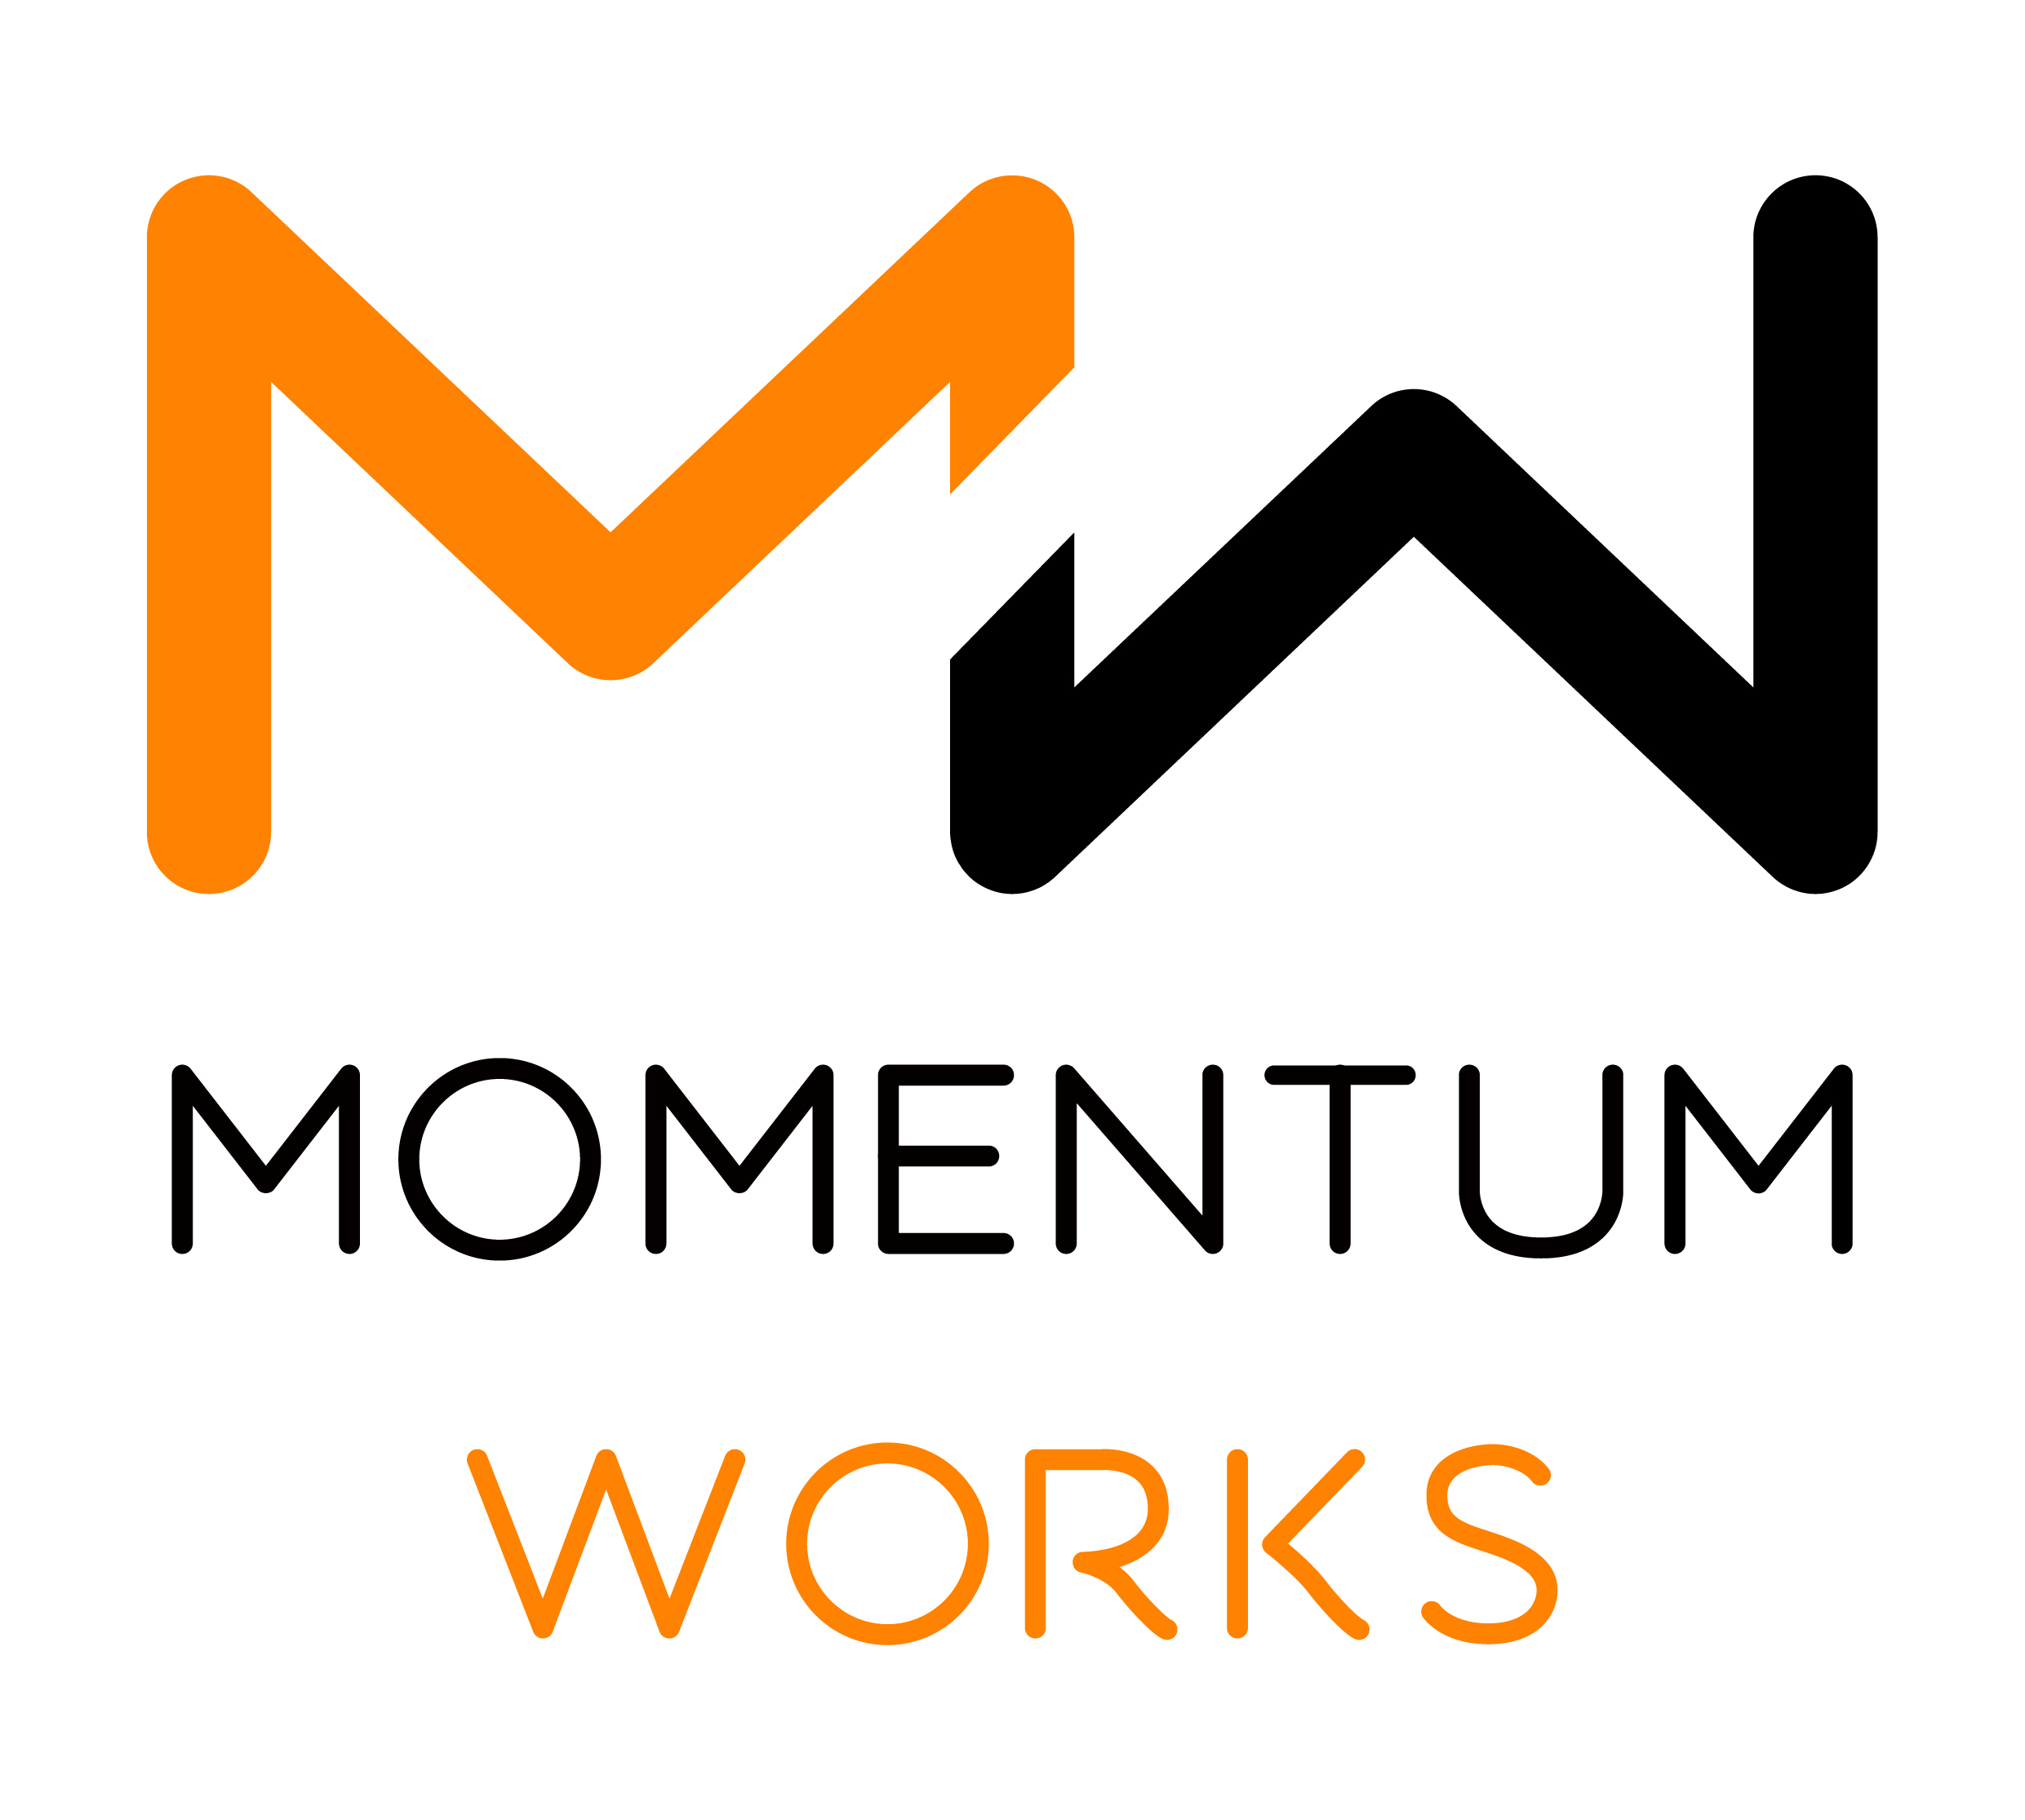 Momentum Works company logo